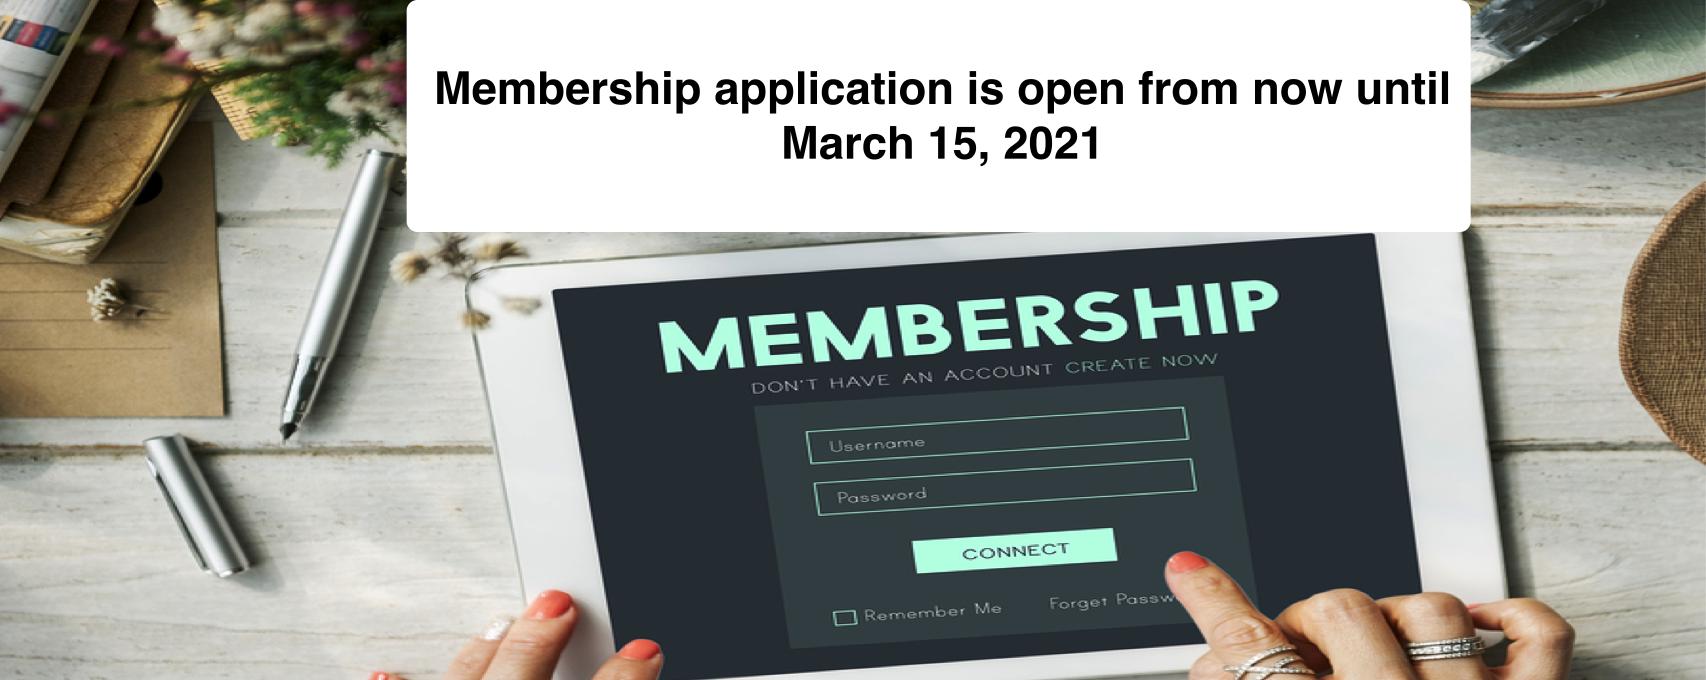 DWW Membership SlideJan 2021